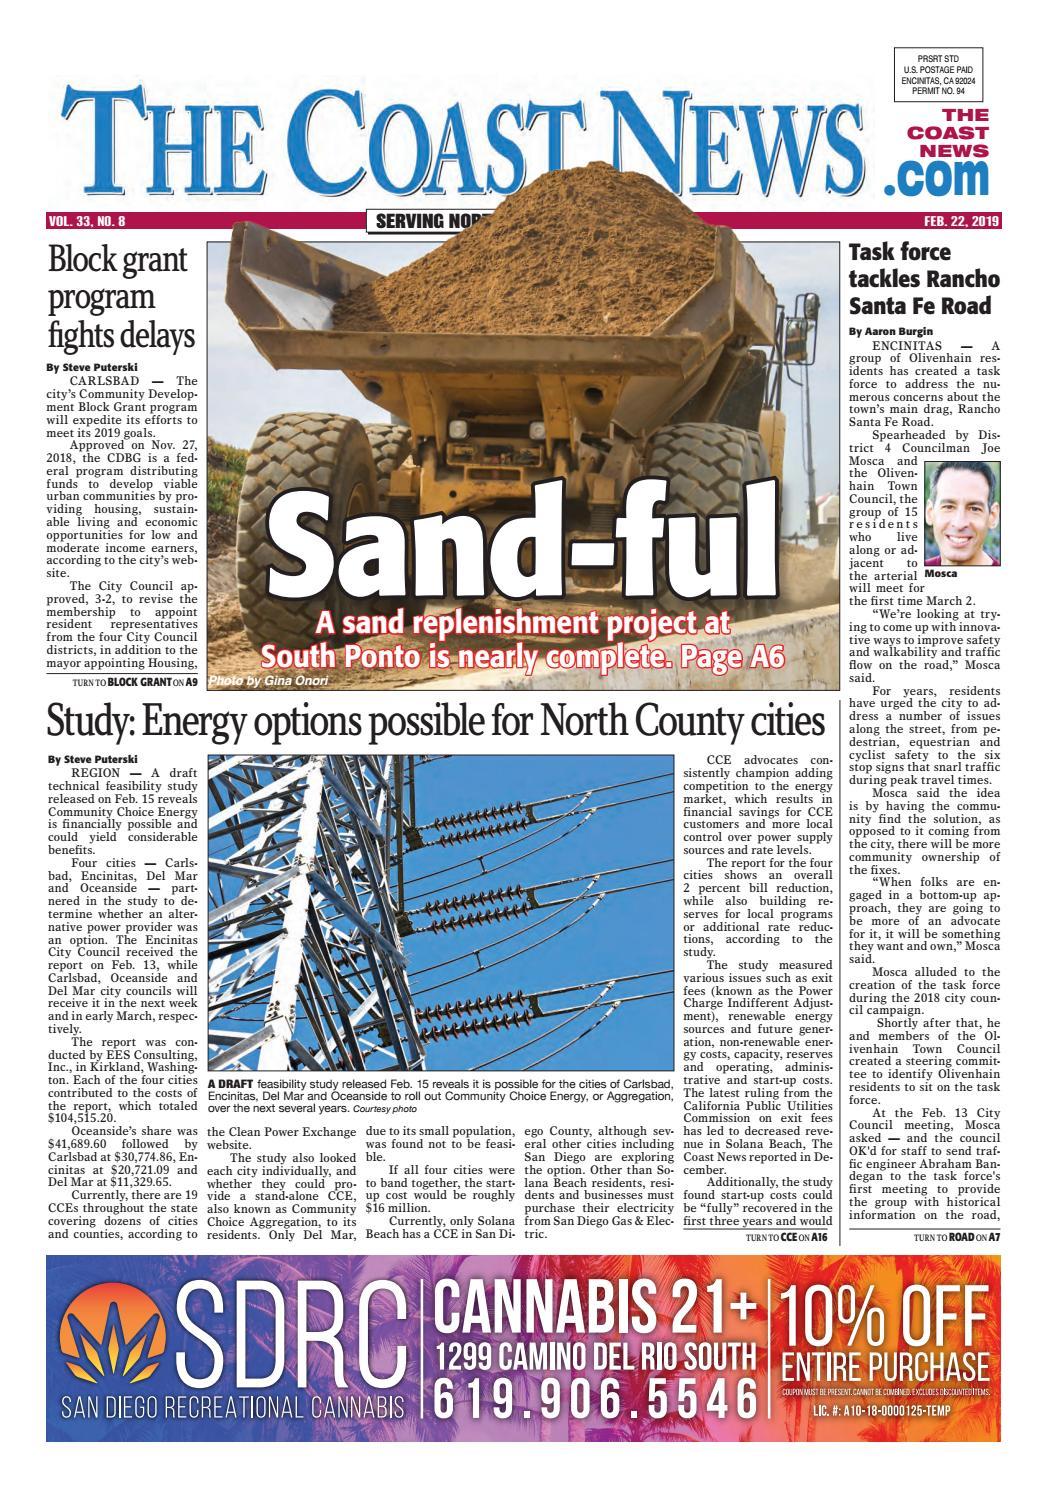 fba74b4c7fea8 The Coast News